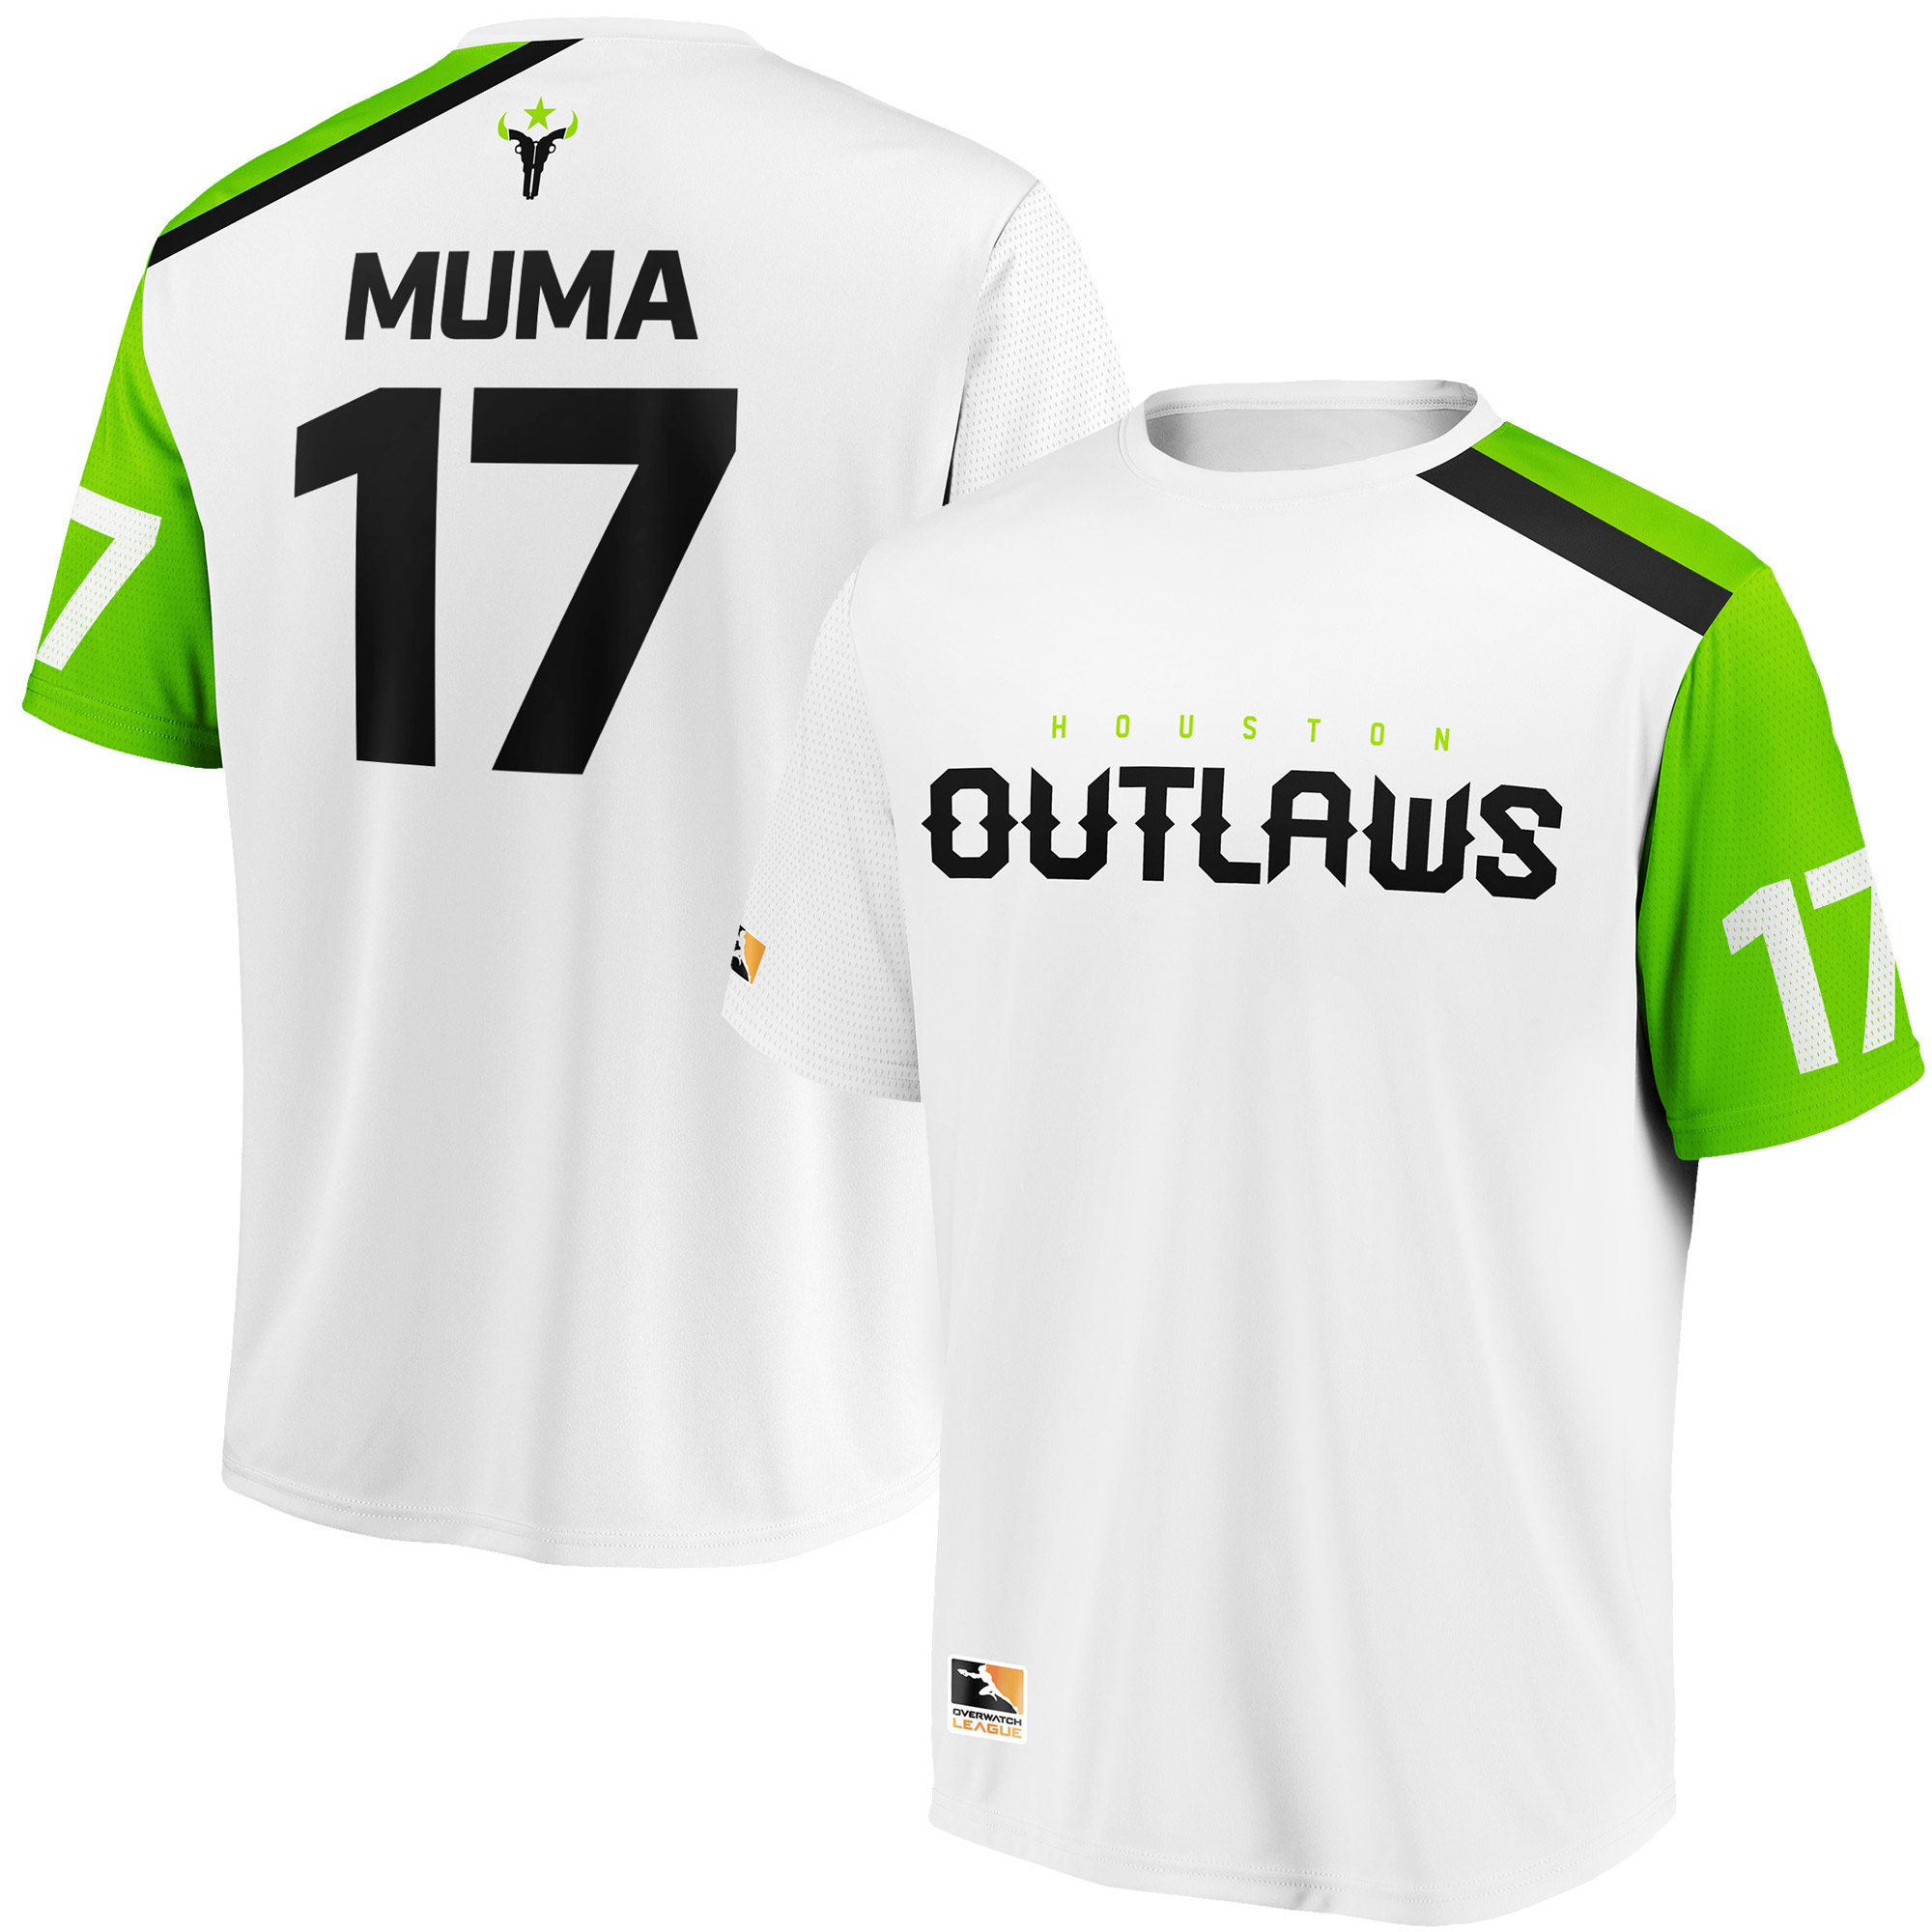 Muma Houston Outlaws Overwatch League Replica Away Jersey - White